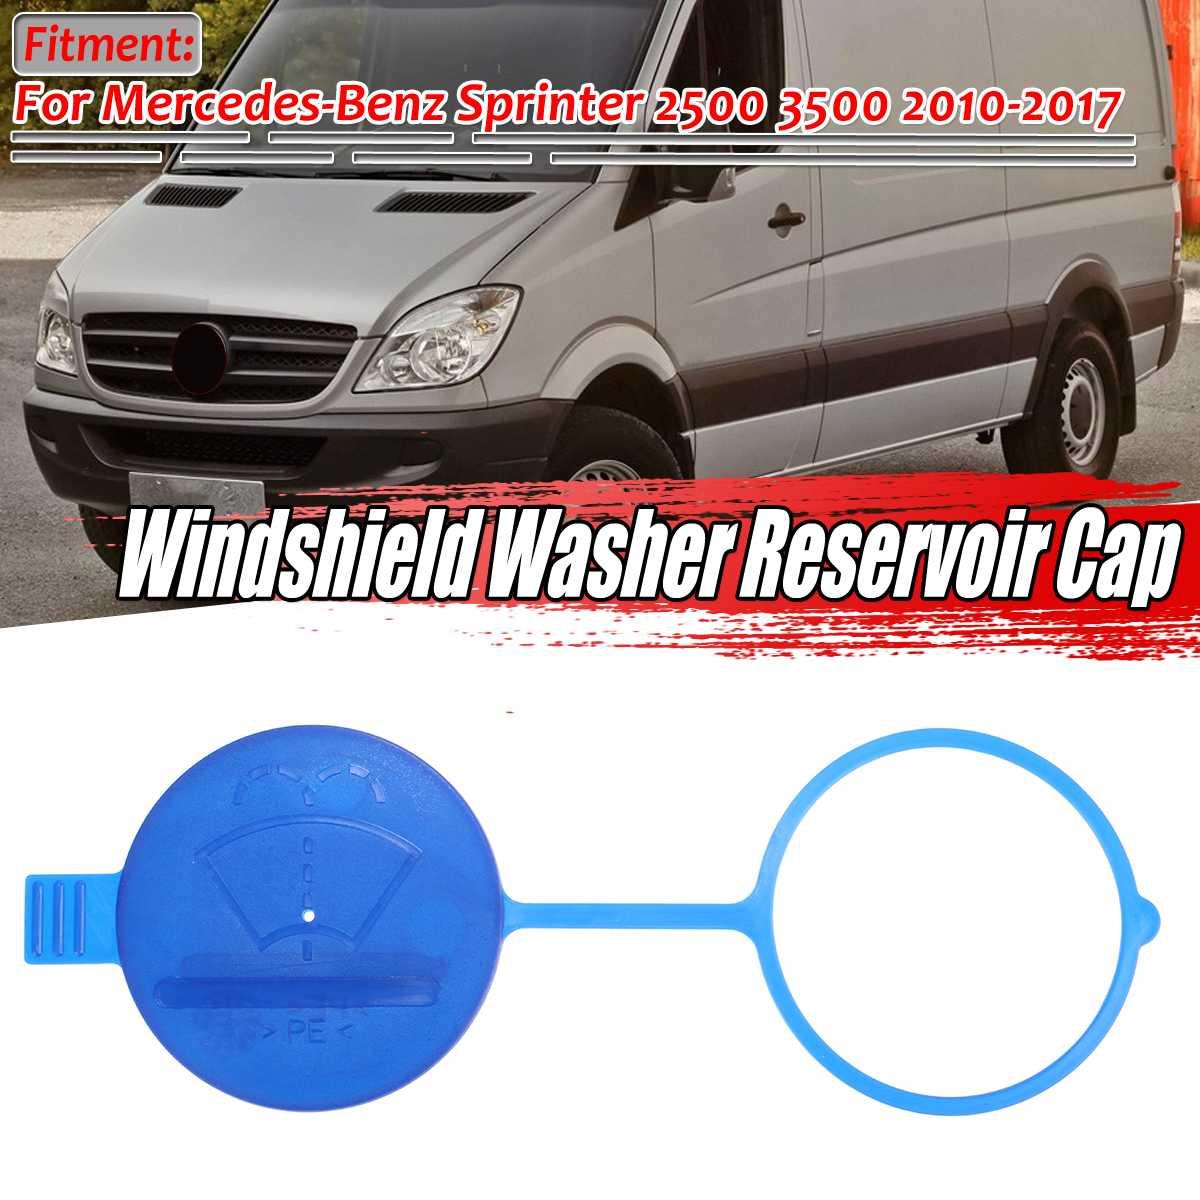 Car Windshield Washer Fluid Reservoir Cap For Mercedes For Benz Sprinter 2500 3500 2010-2017 6388690008 A9068690072